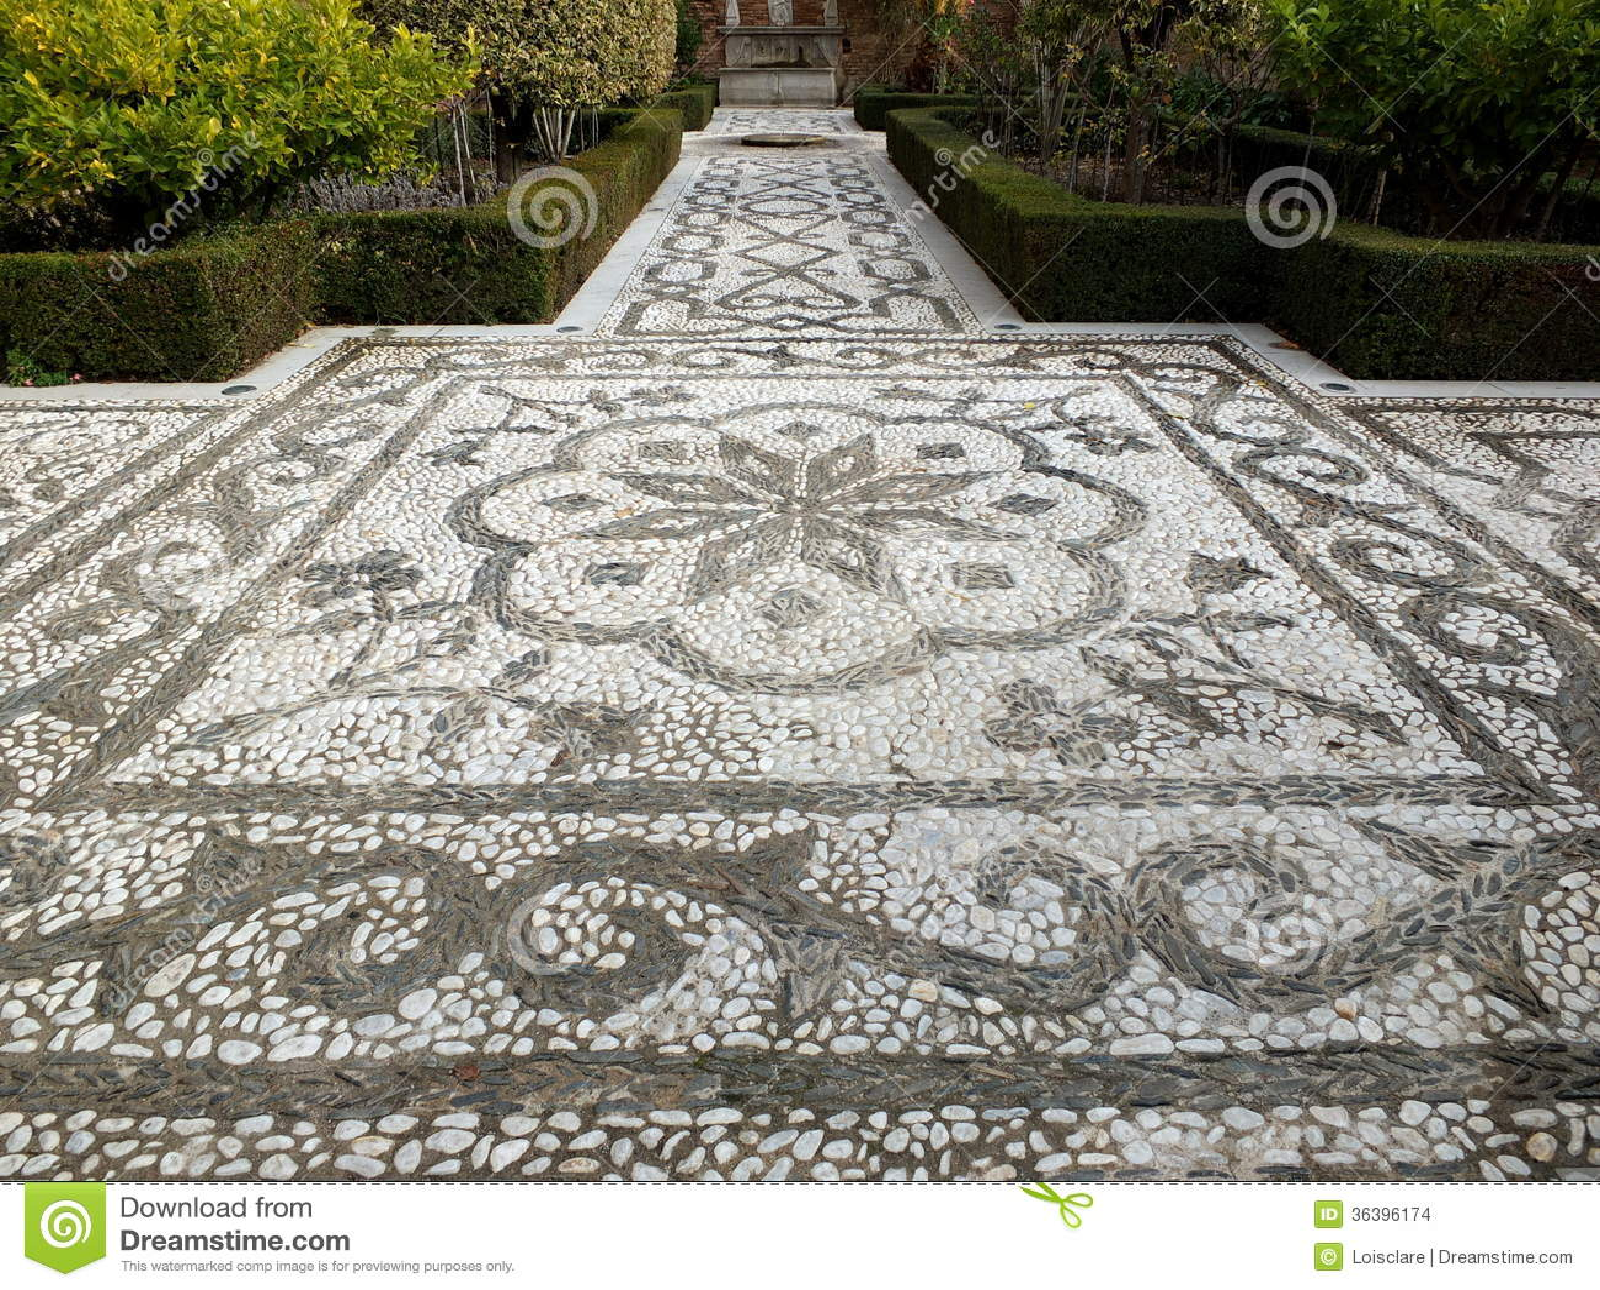 Genial Mosaik Garten Dekoration Von Mosaik-garten-weg